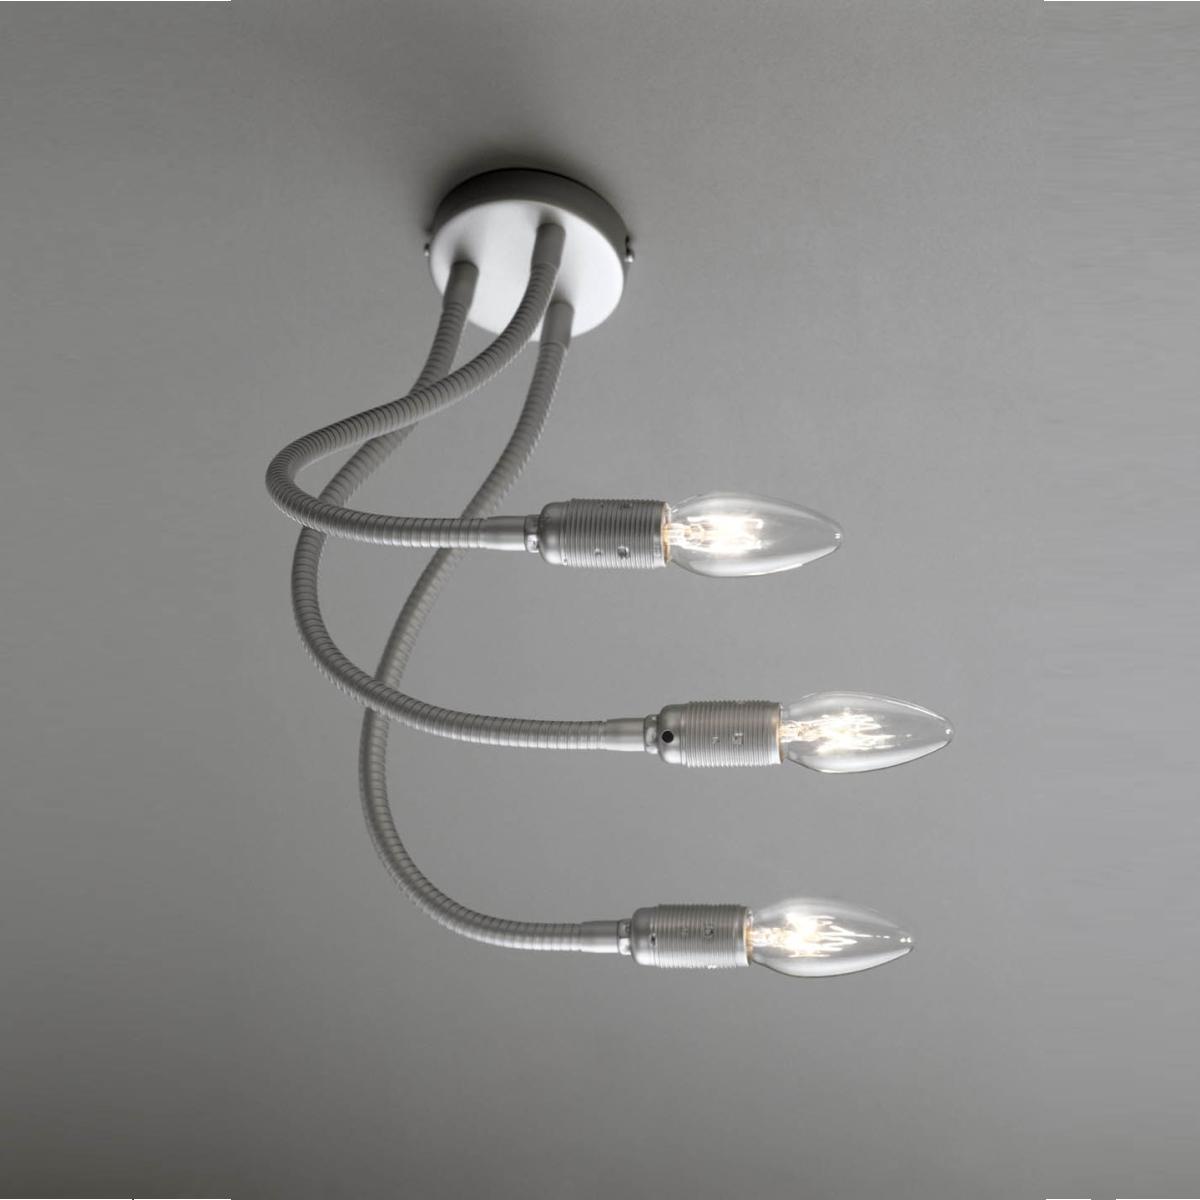 Dreiarm Wandleuchte / Deckenleuchte chrom, LED Kerze klar oder matt